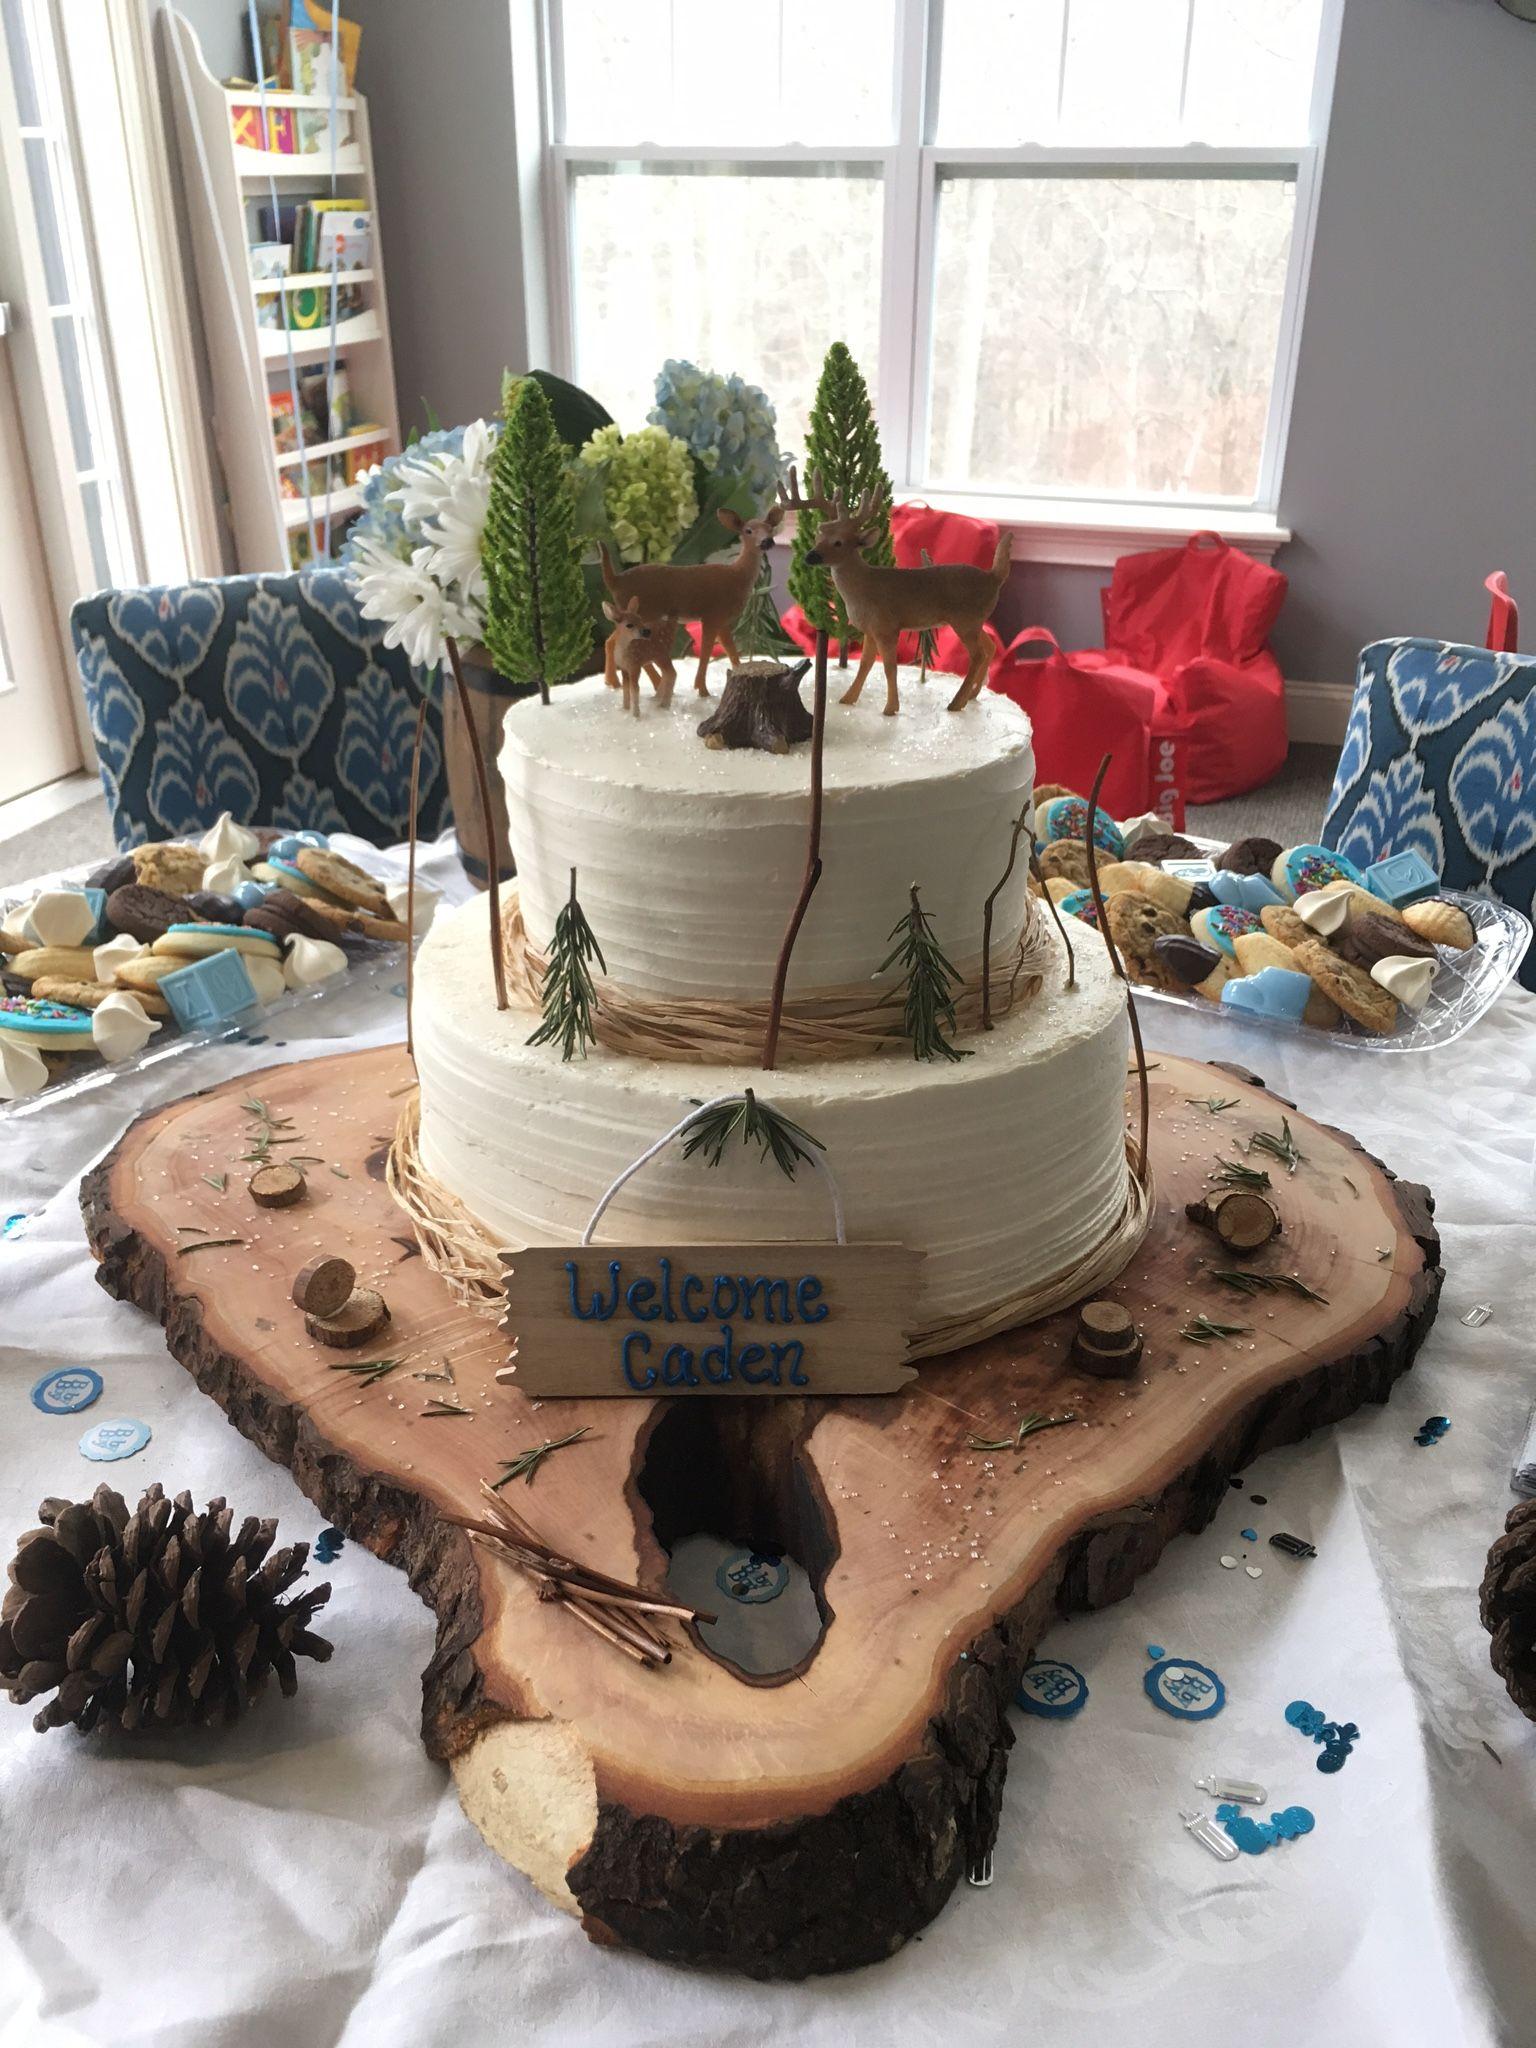 Hunting Baby Shower Cake : hunting, shower, Shower, Cake,, Cupcakes, Woodland, Theme